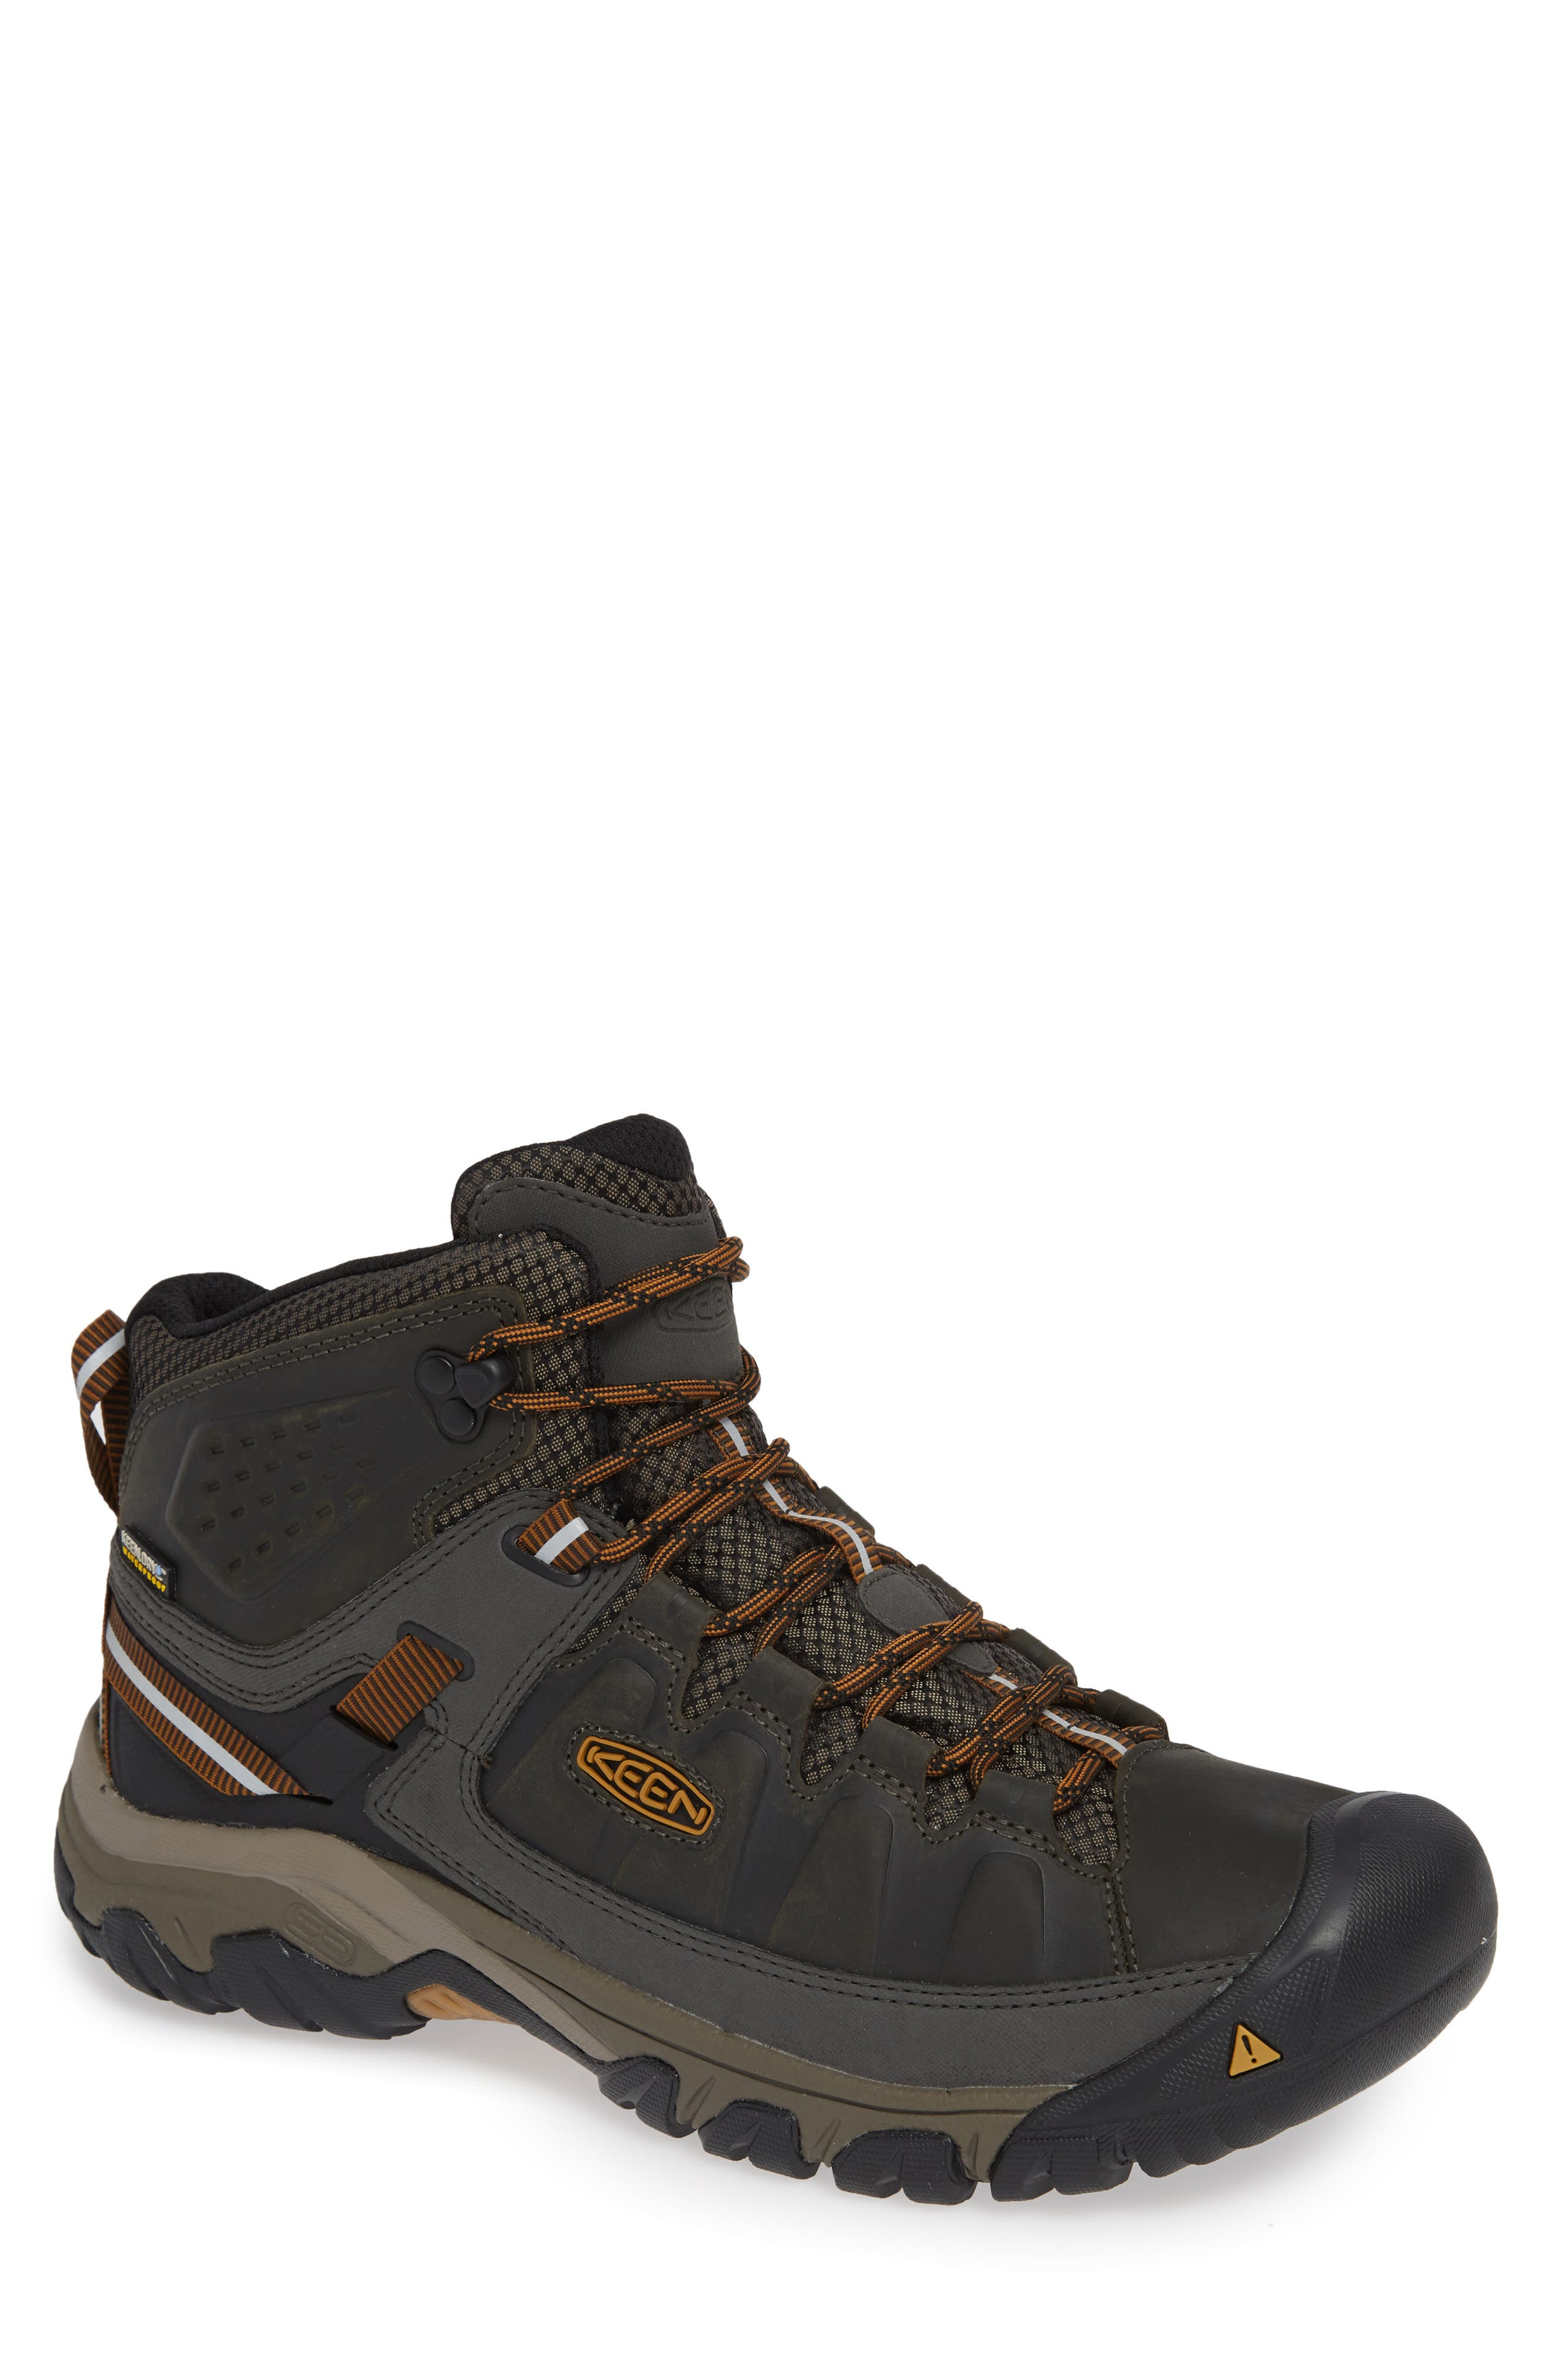 b6e206bb2 Keen Targhee Iii Mid Waterproof Hiking Boot